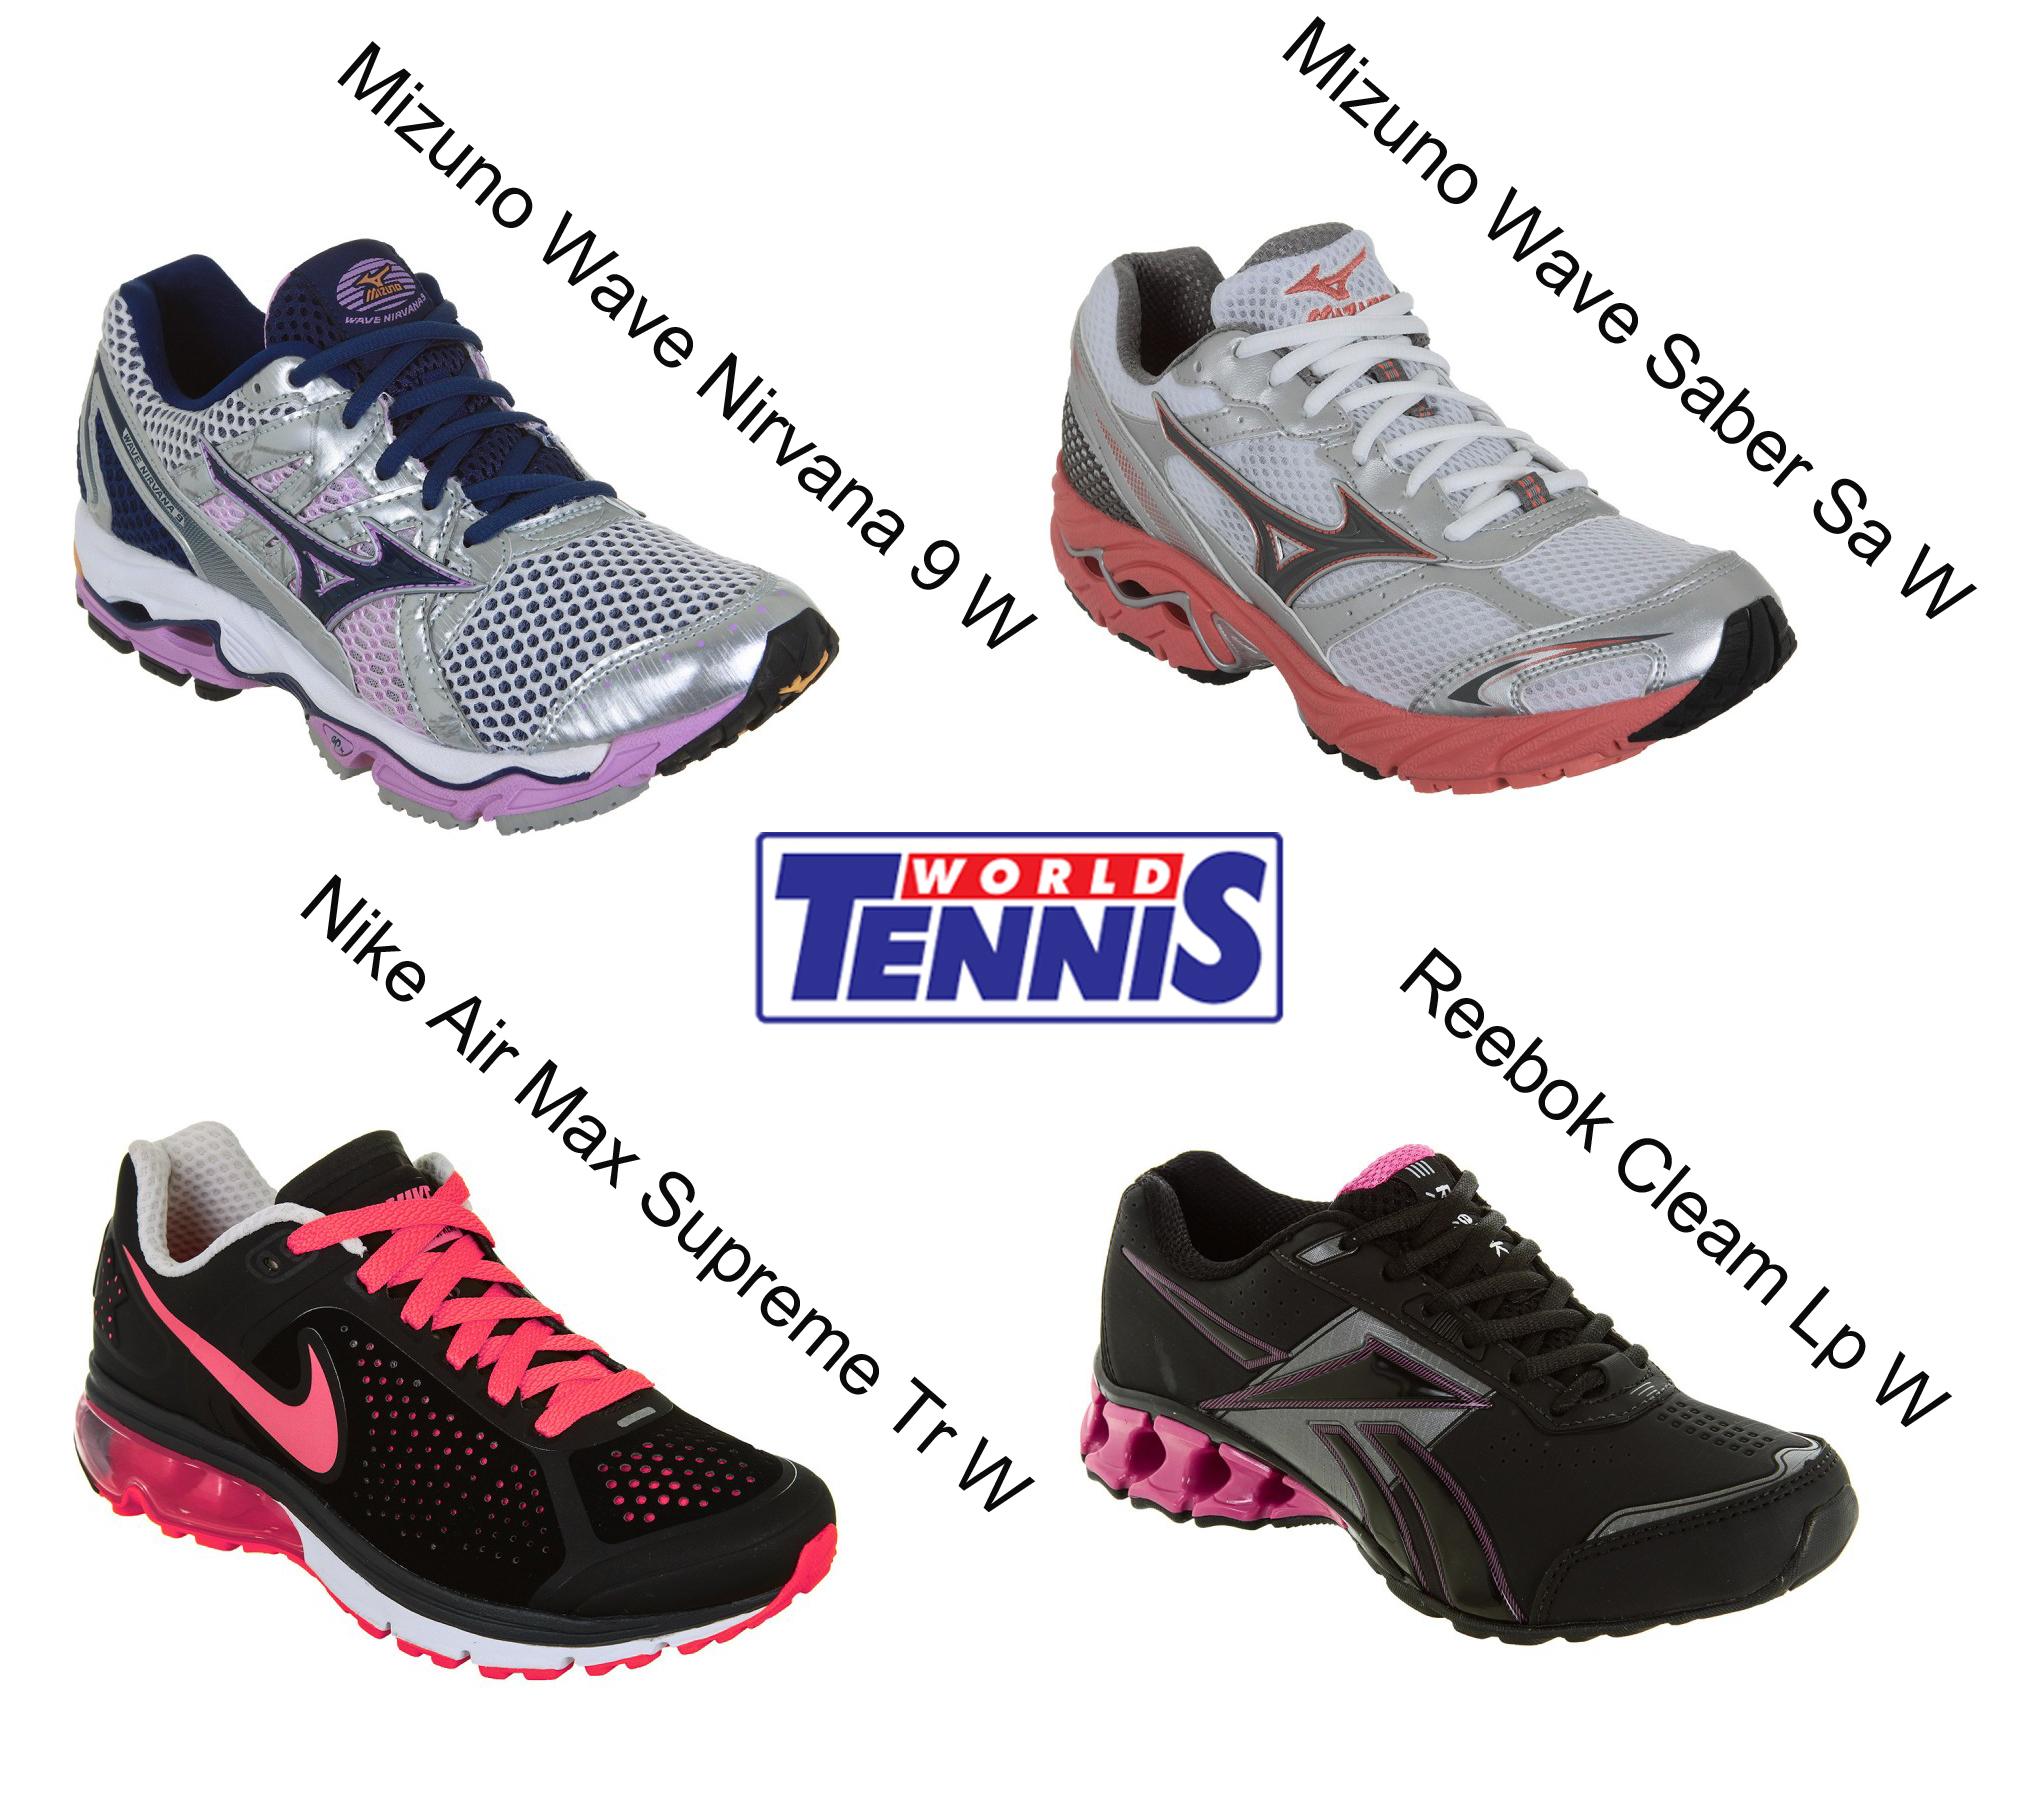 45aaa963d7 Arquivos Reebok - World Tennis - Tênis